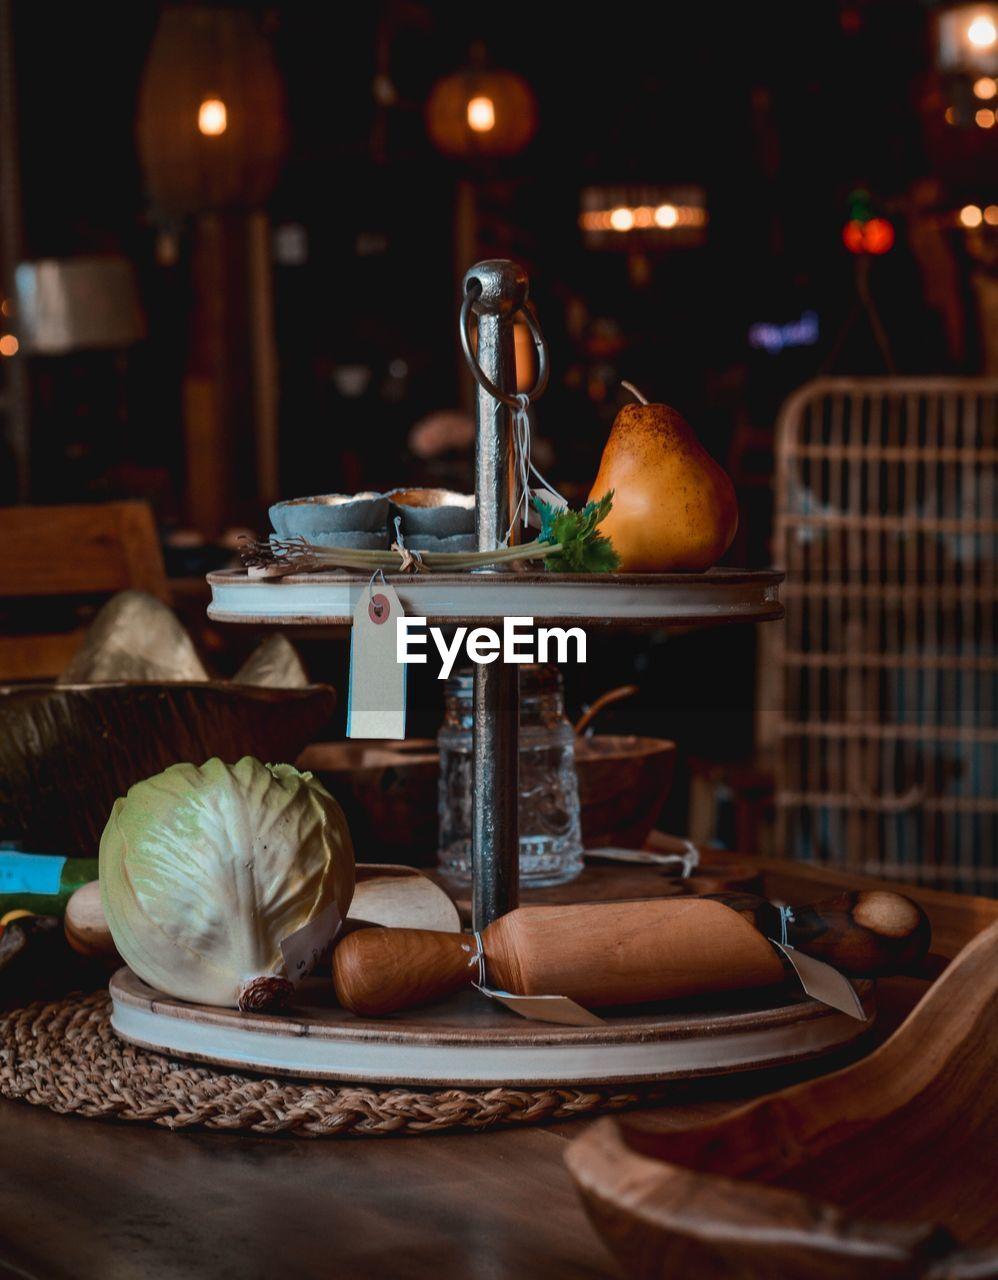 Food on rack at table